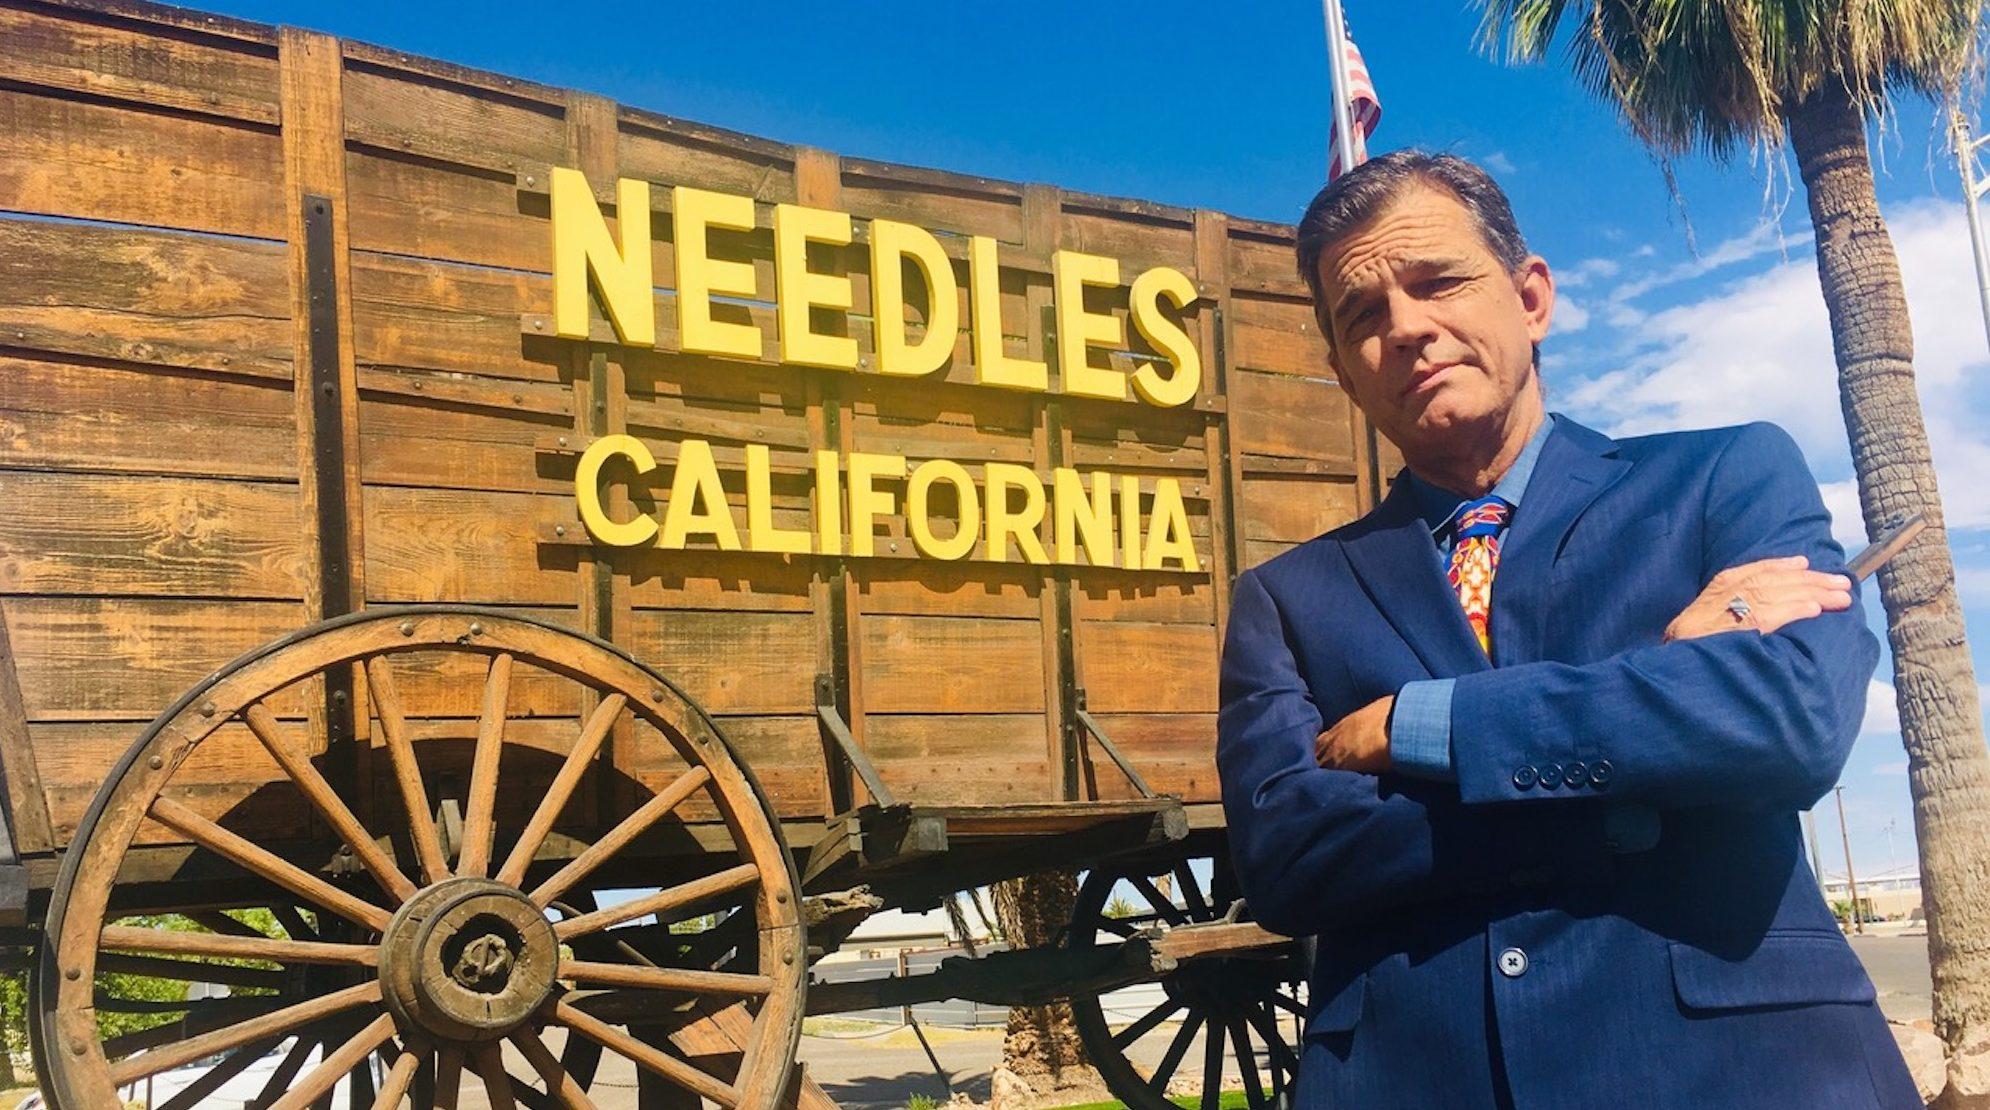 California gun sanctuary Needles